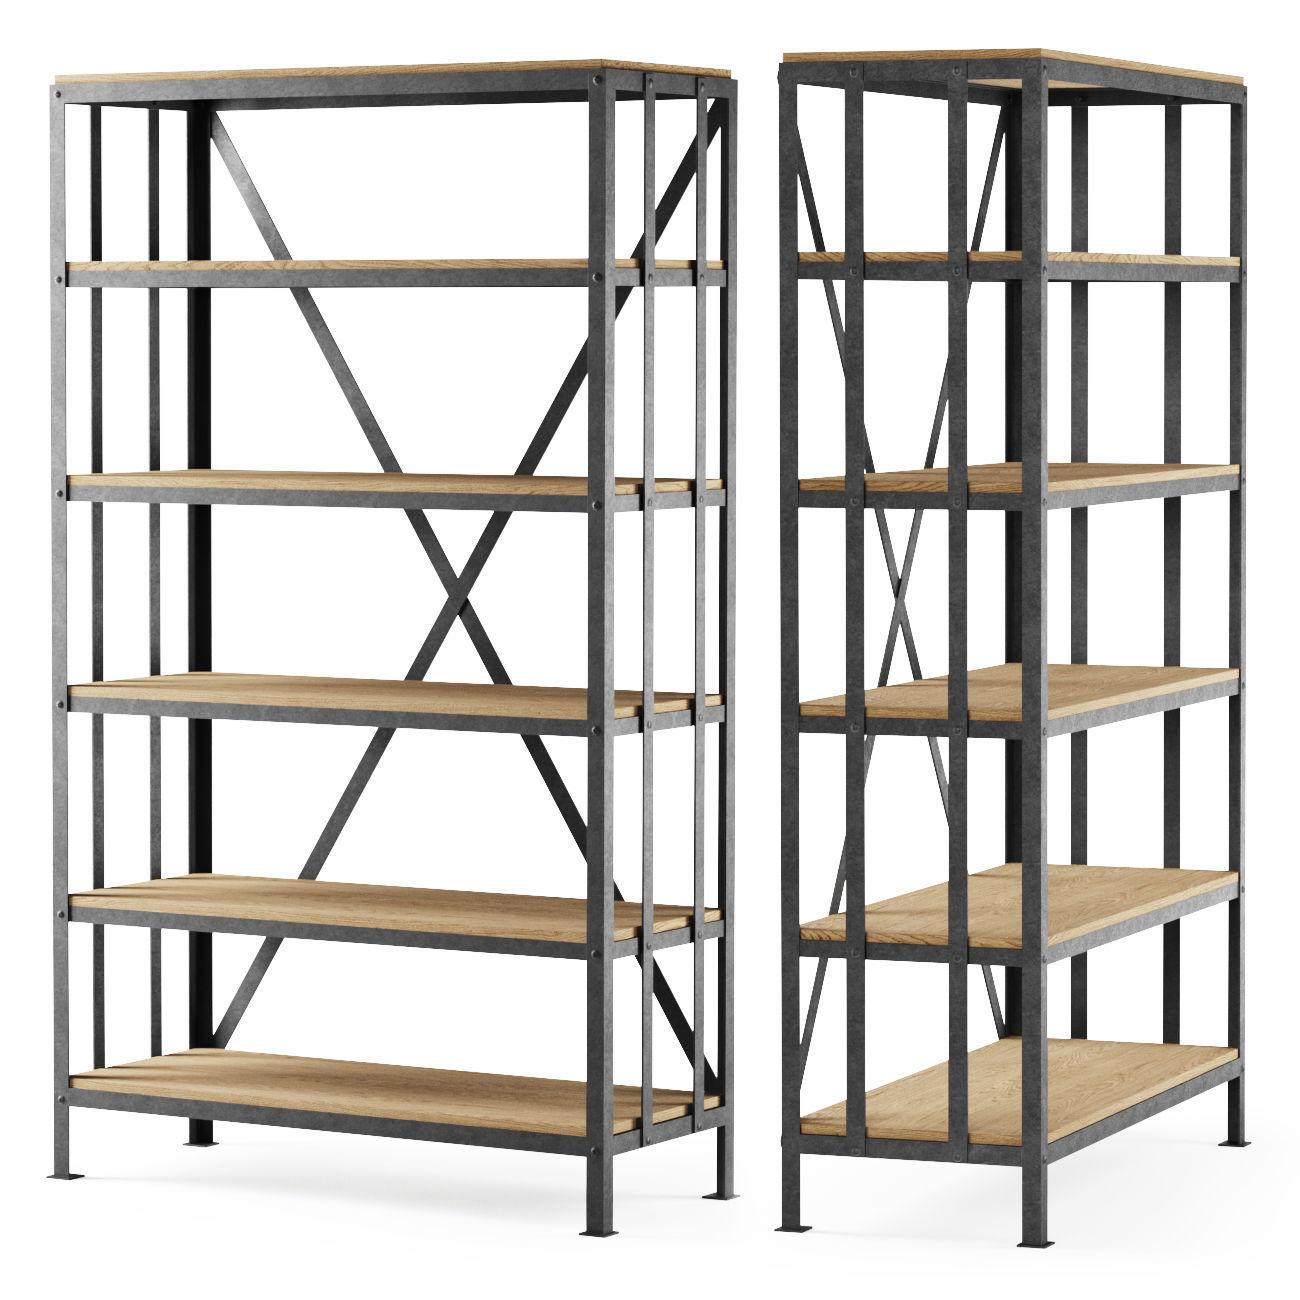 Metal rack middle